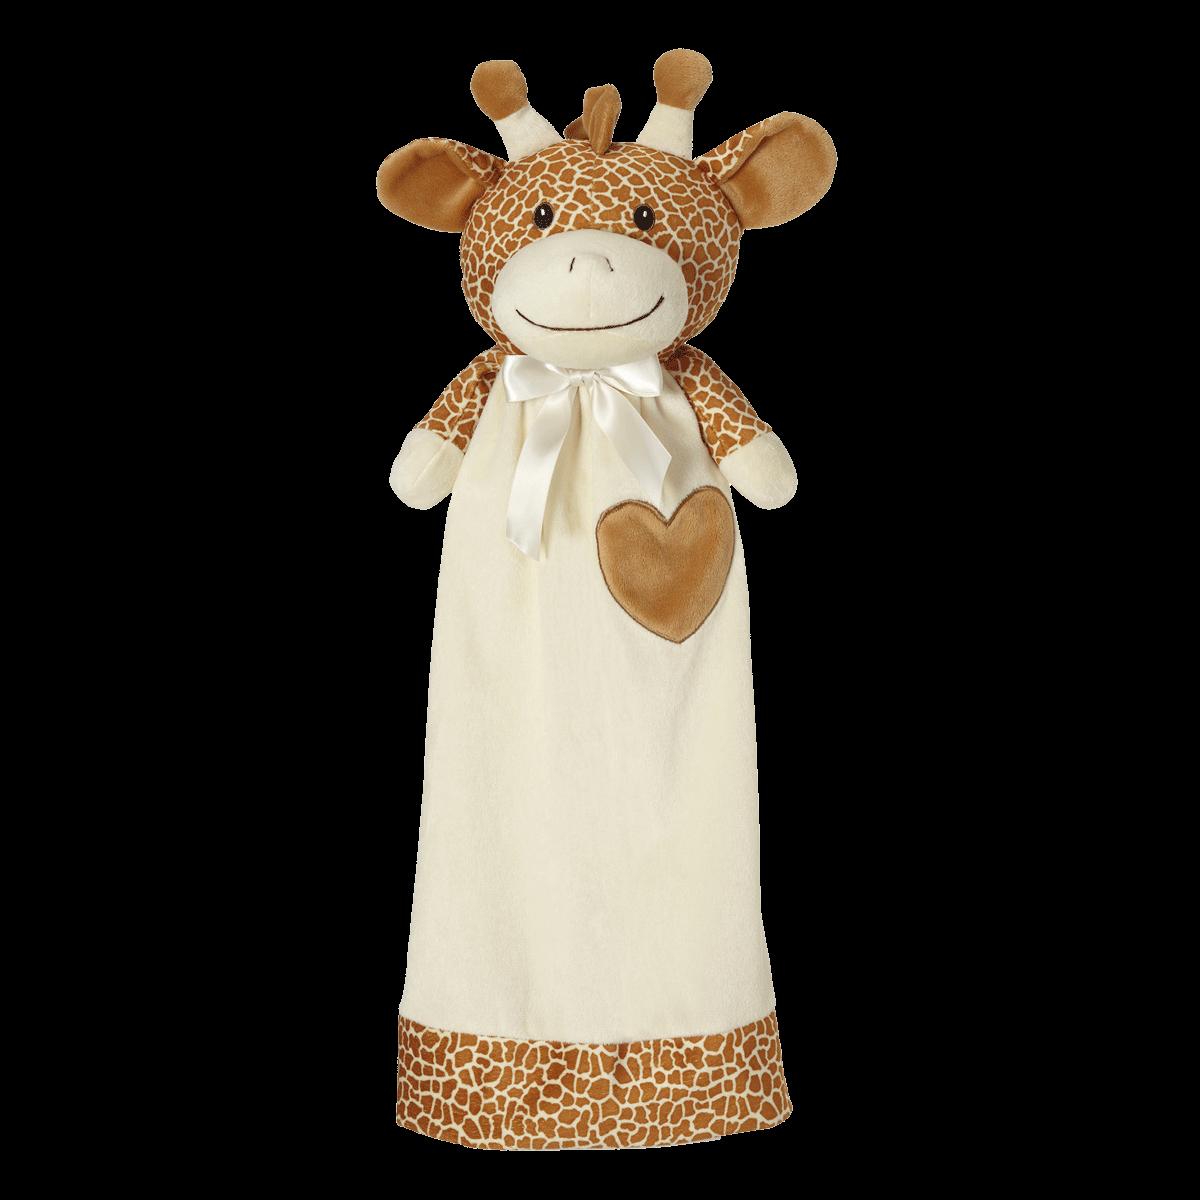 Embroider Buddy® – Blankey Buddy Giraffe